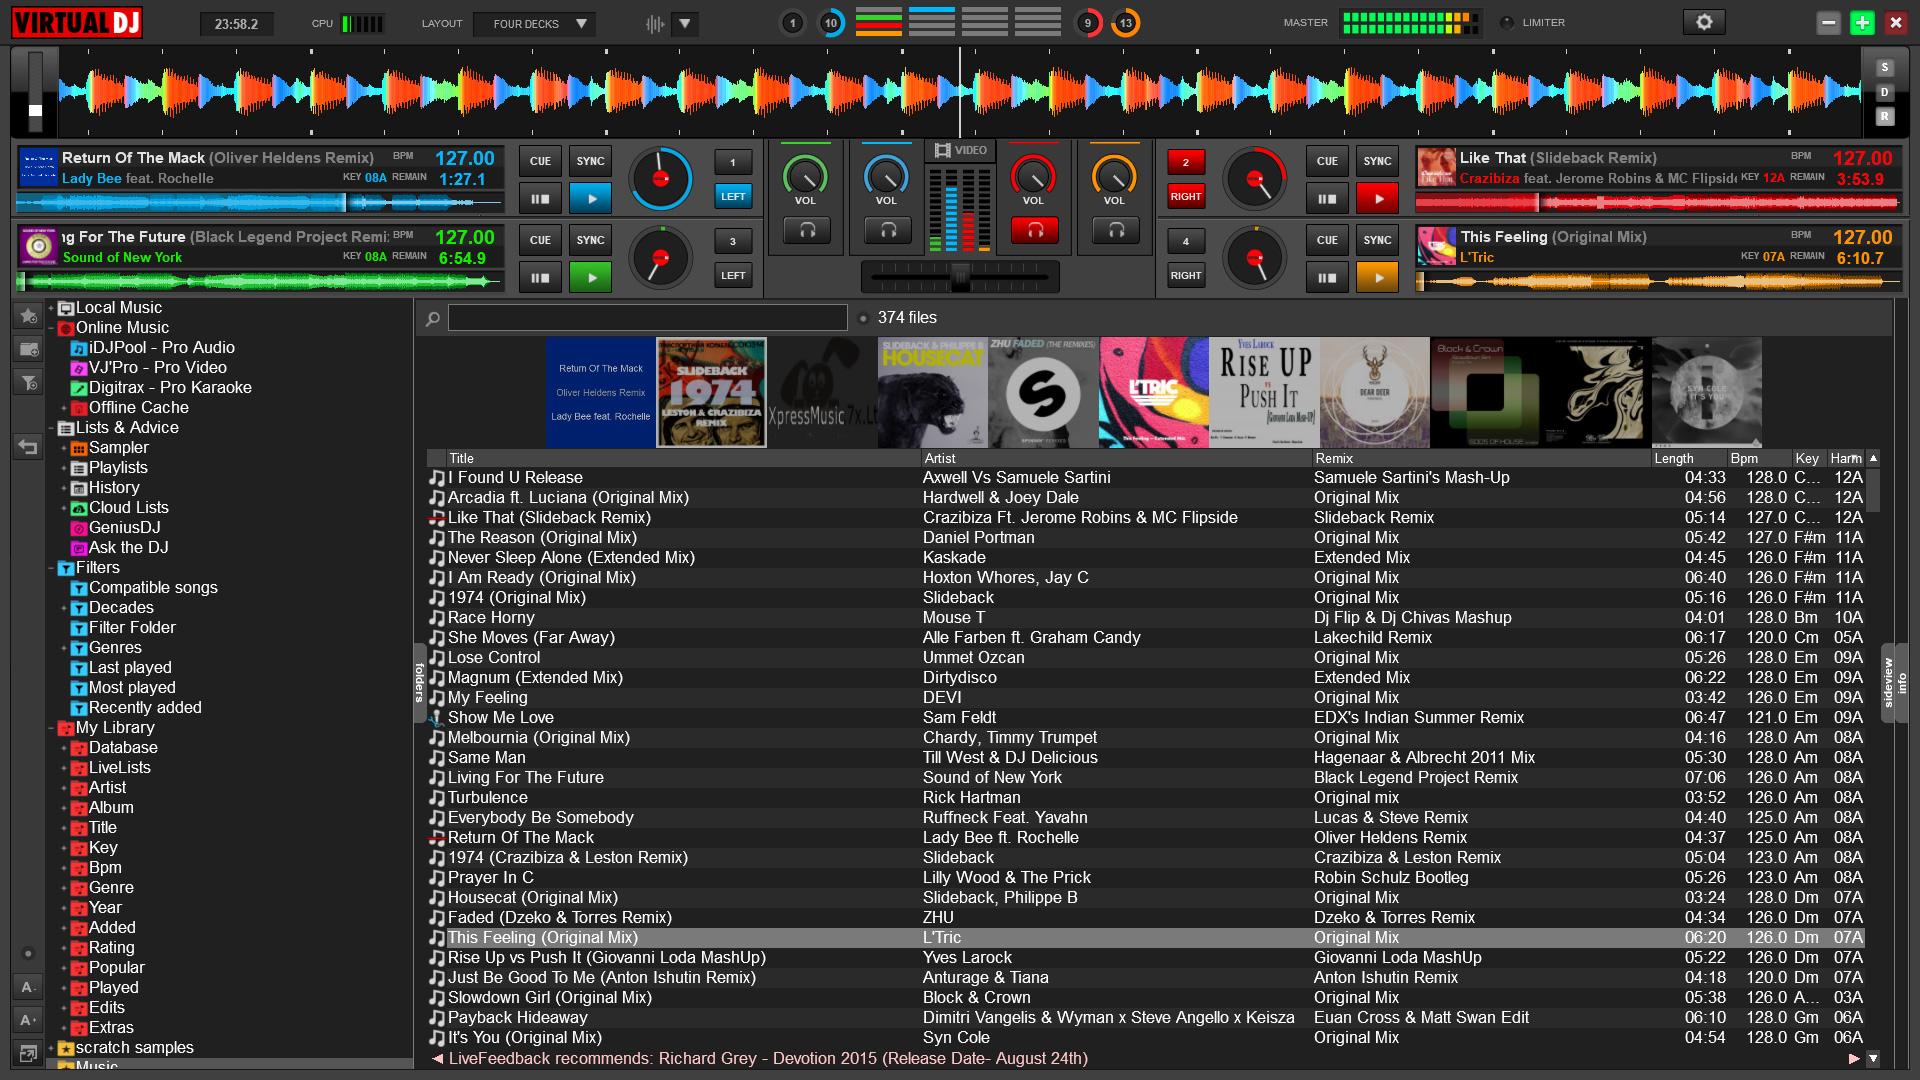 Dj Software Virtualdj Screenshots